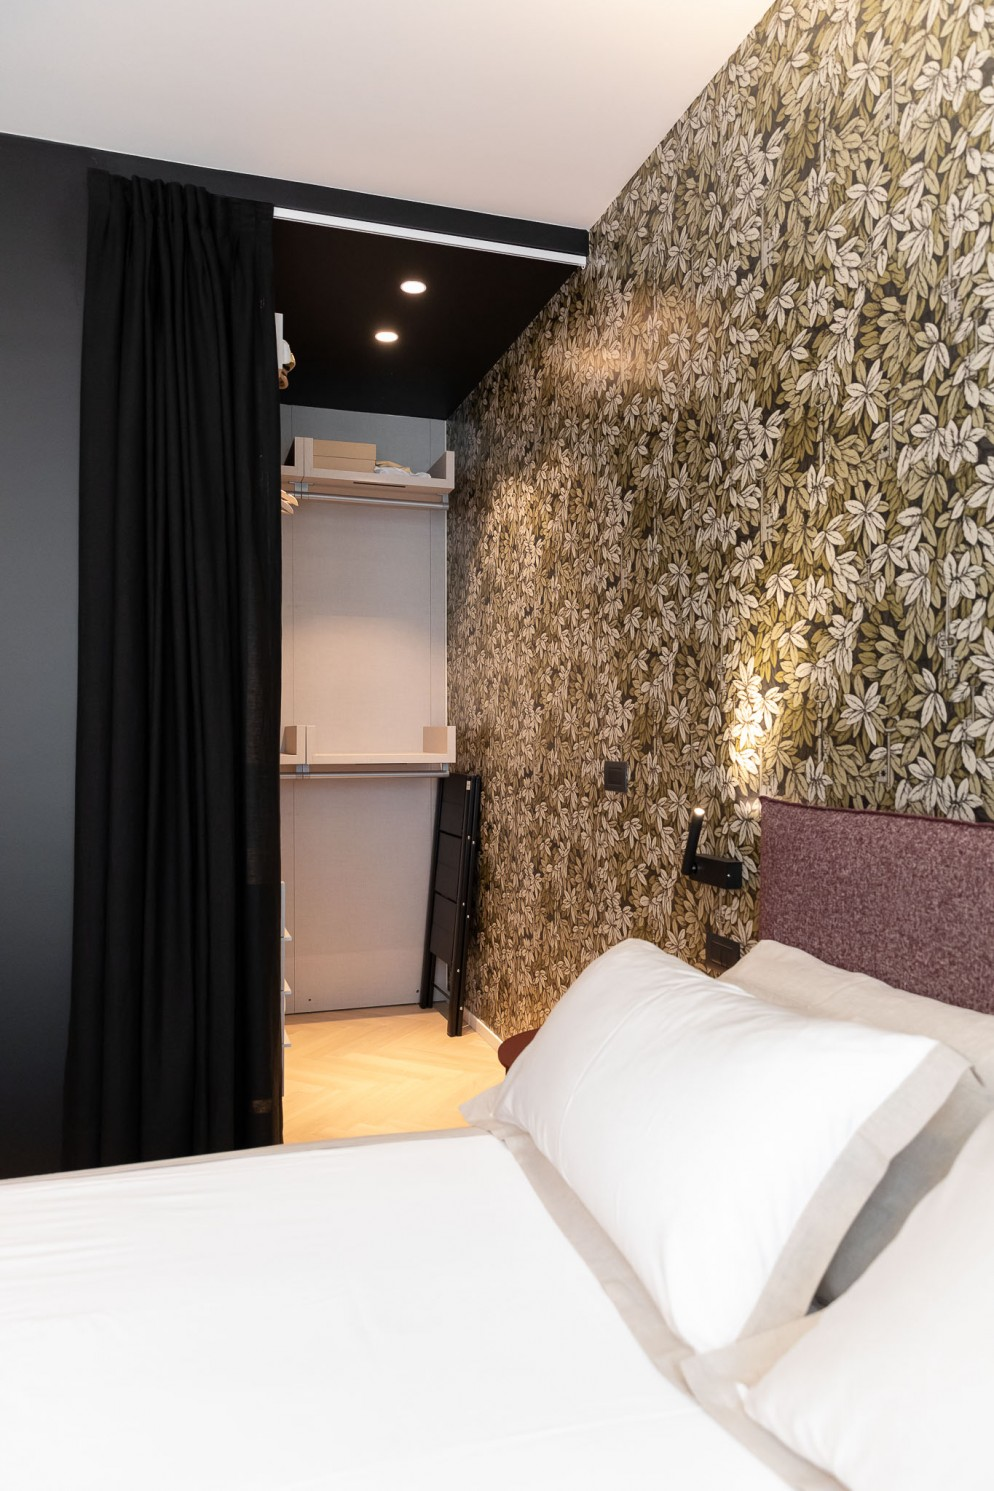 cabina armadio camera piccola (5)